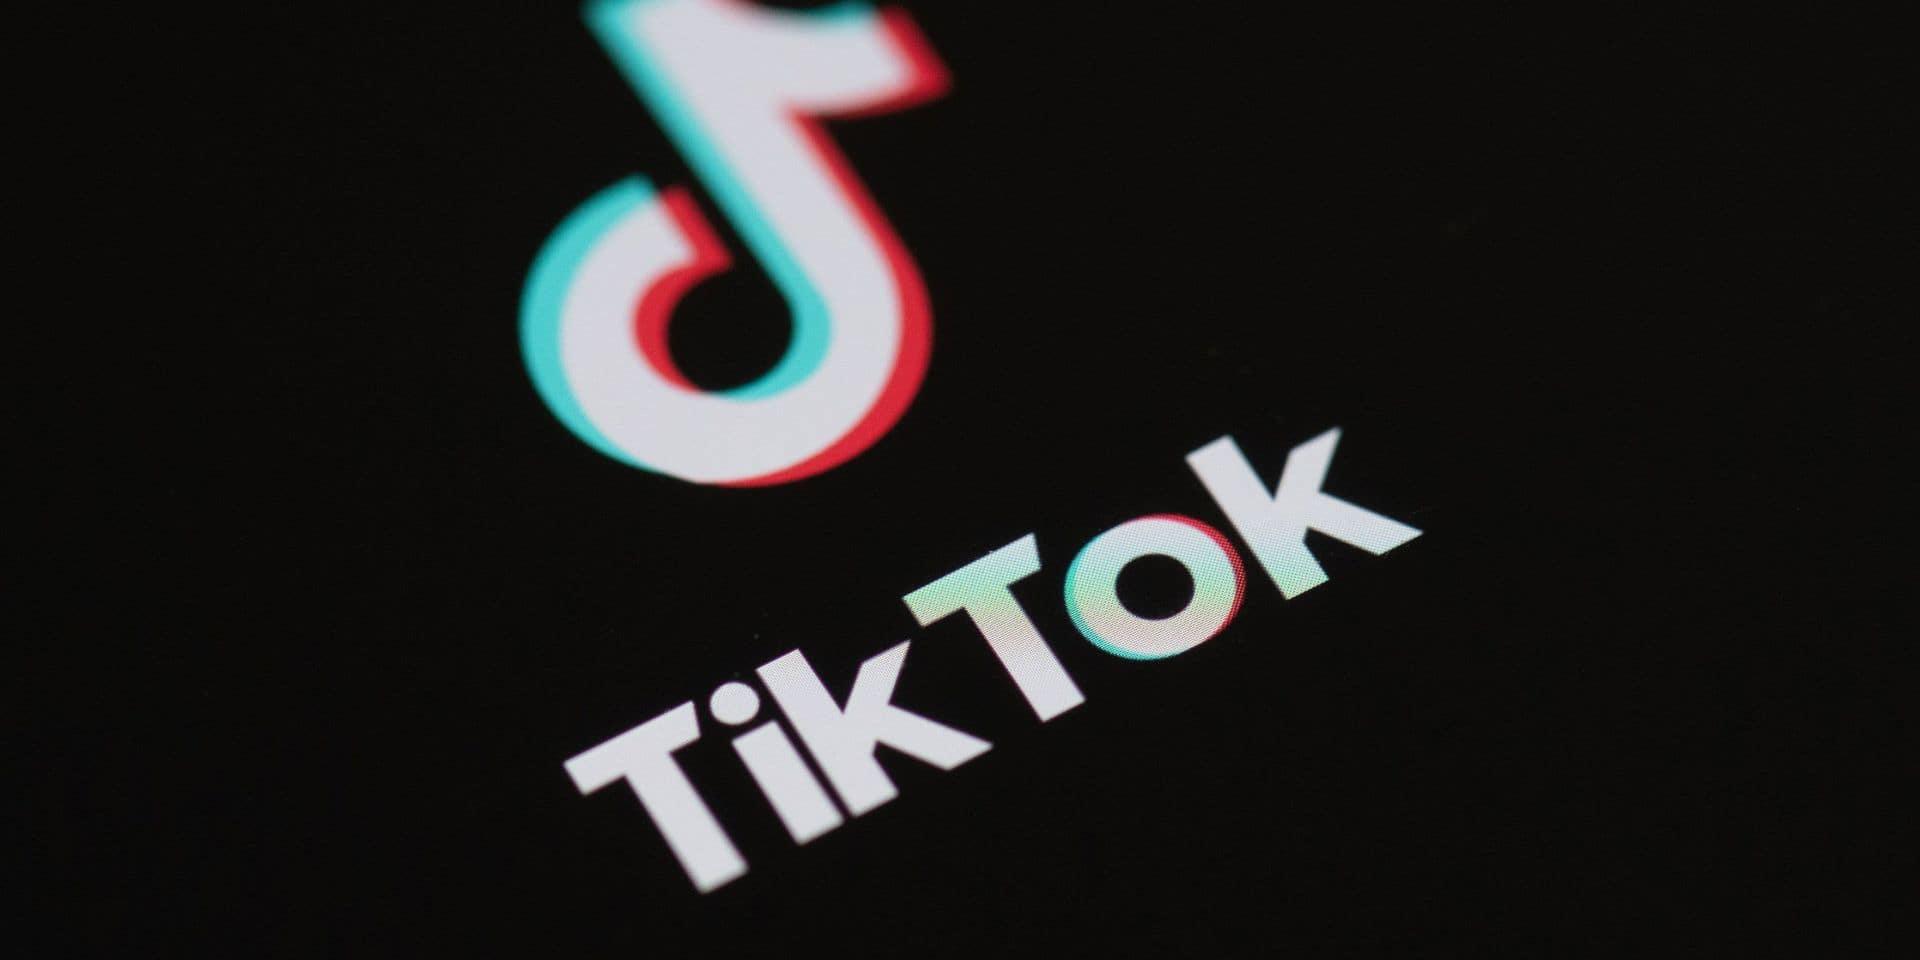 Walmart s'allie à Microsoft pour racheter TikTok